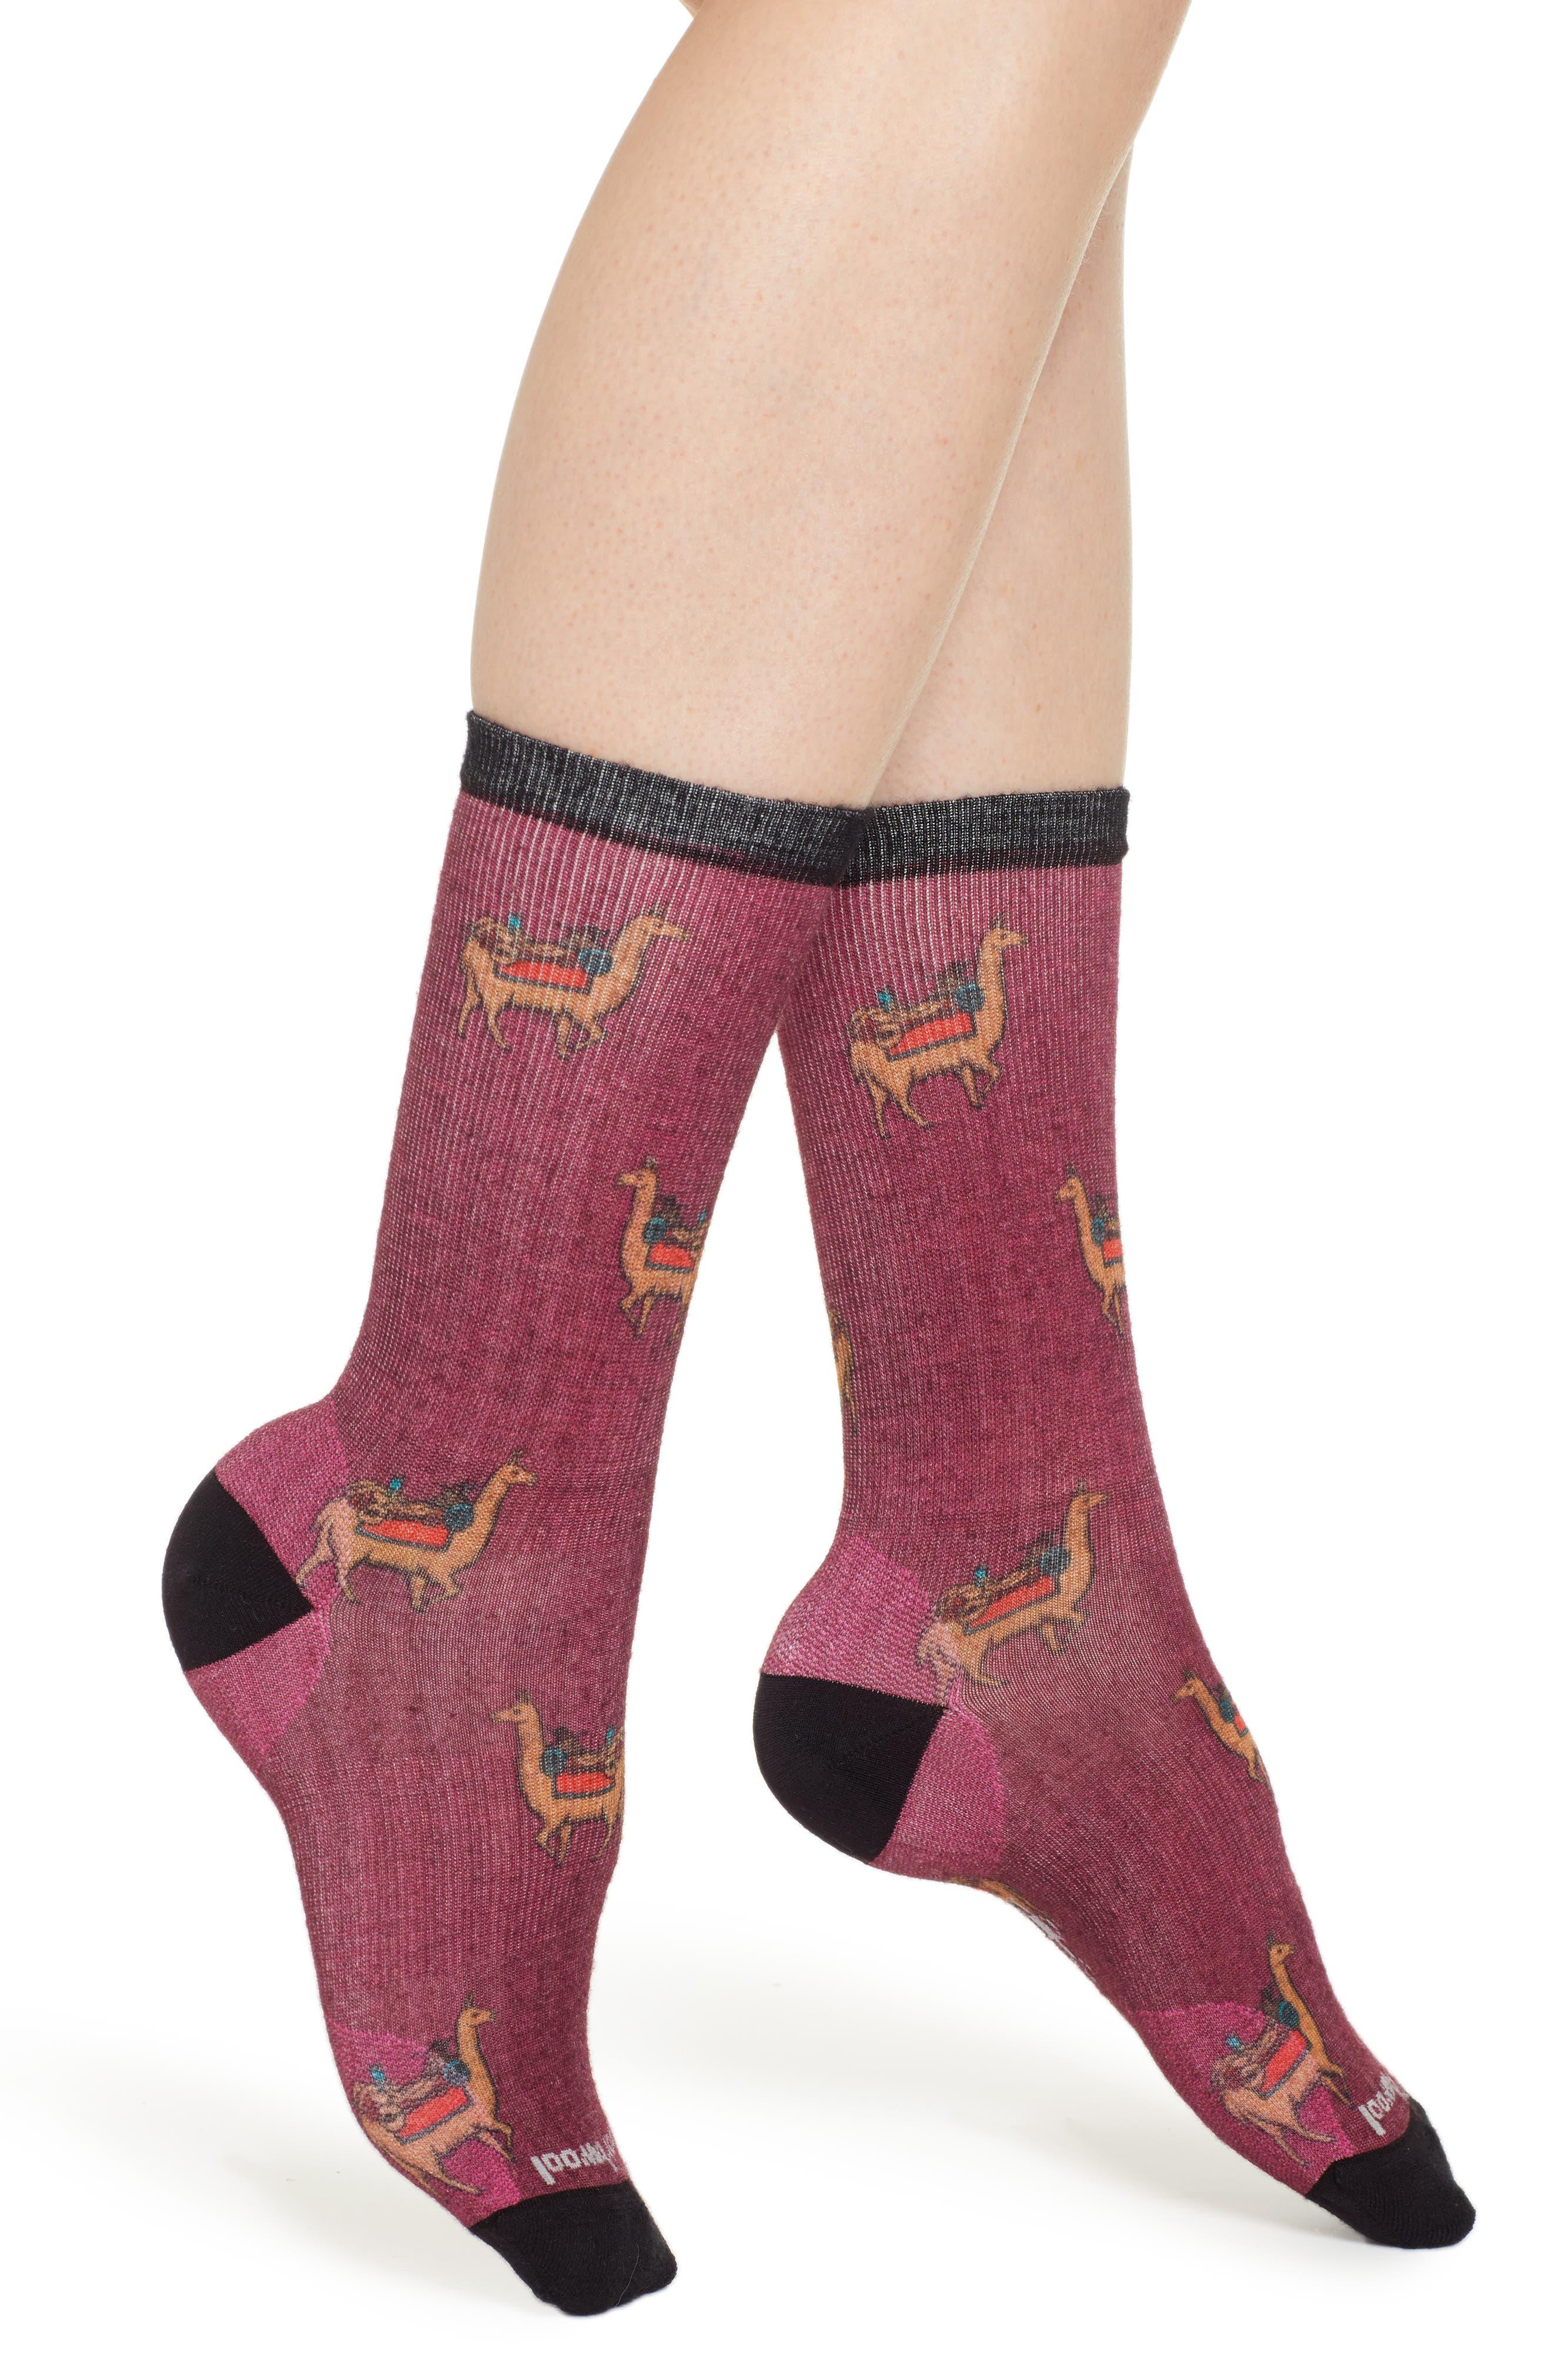 SMARTWOOL Curated Llama Adventures Crew Socks, Main, color, WHITE MULTI